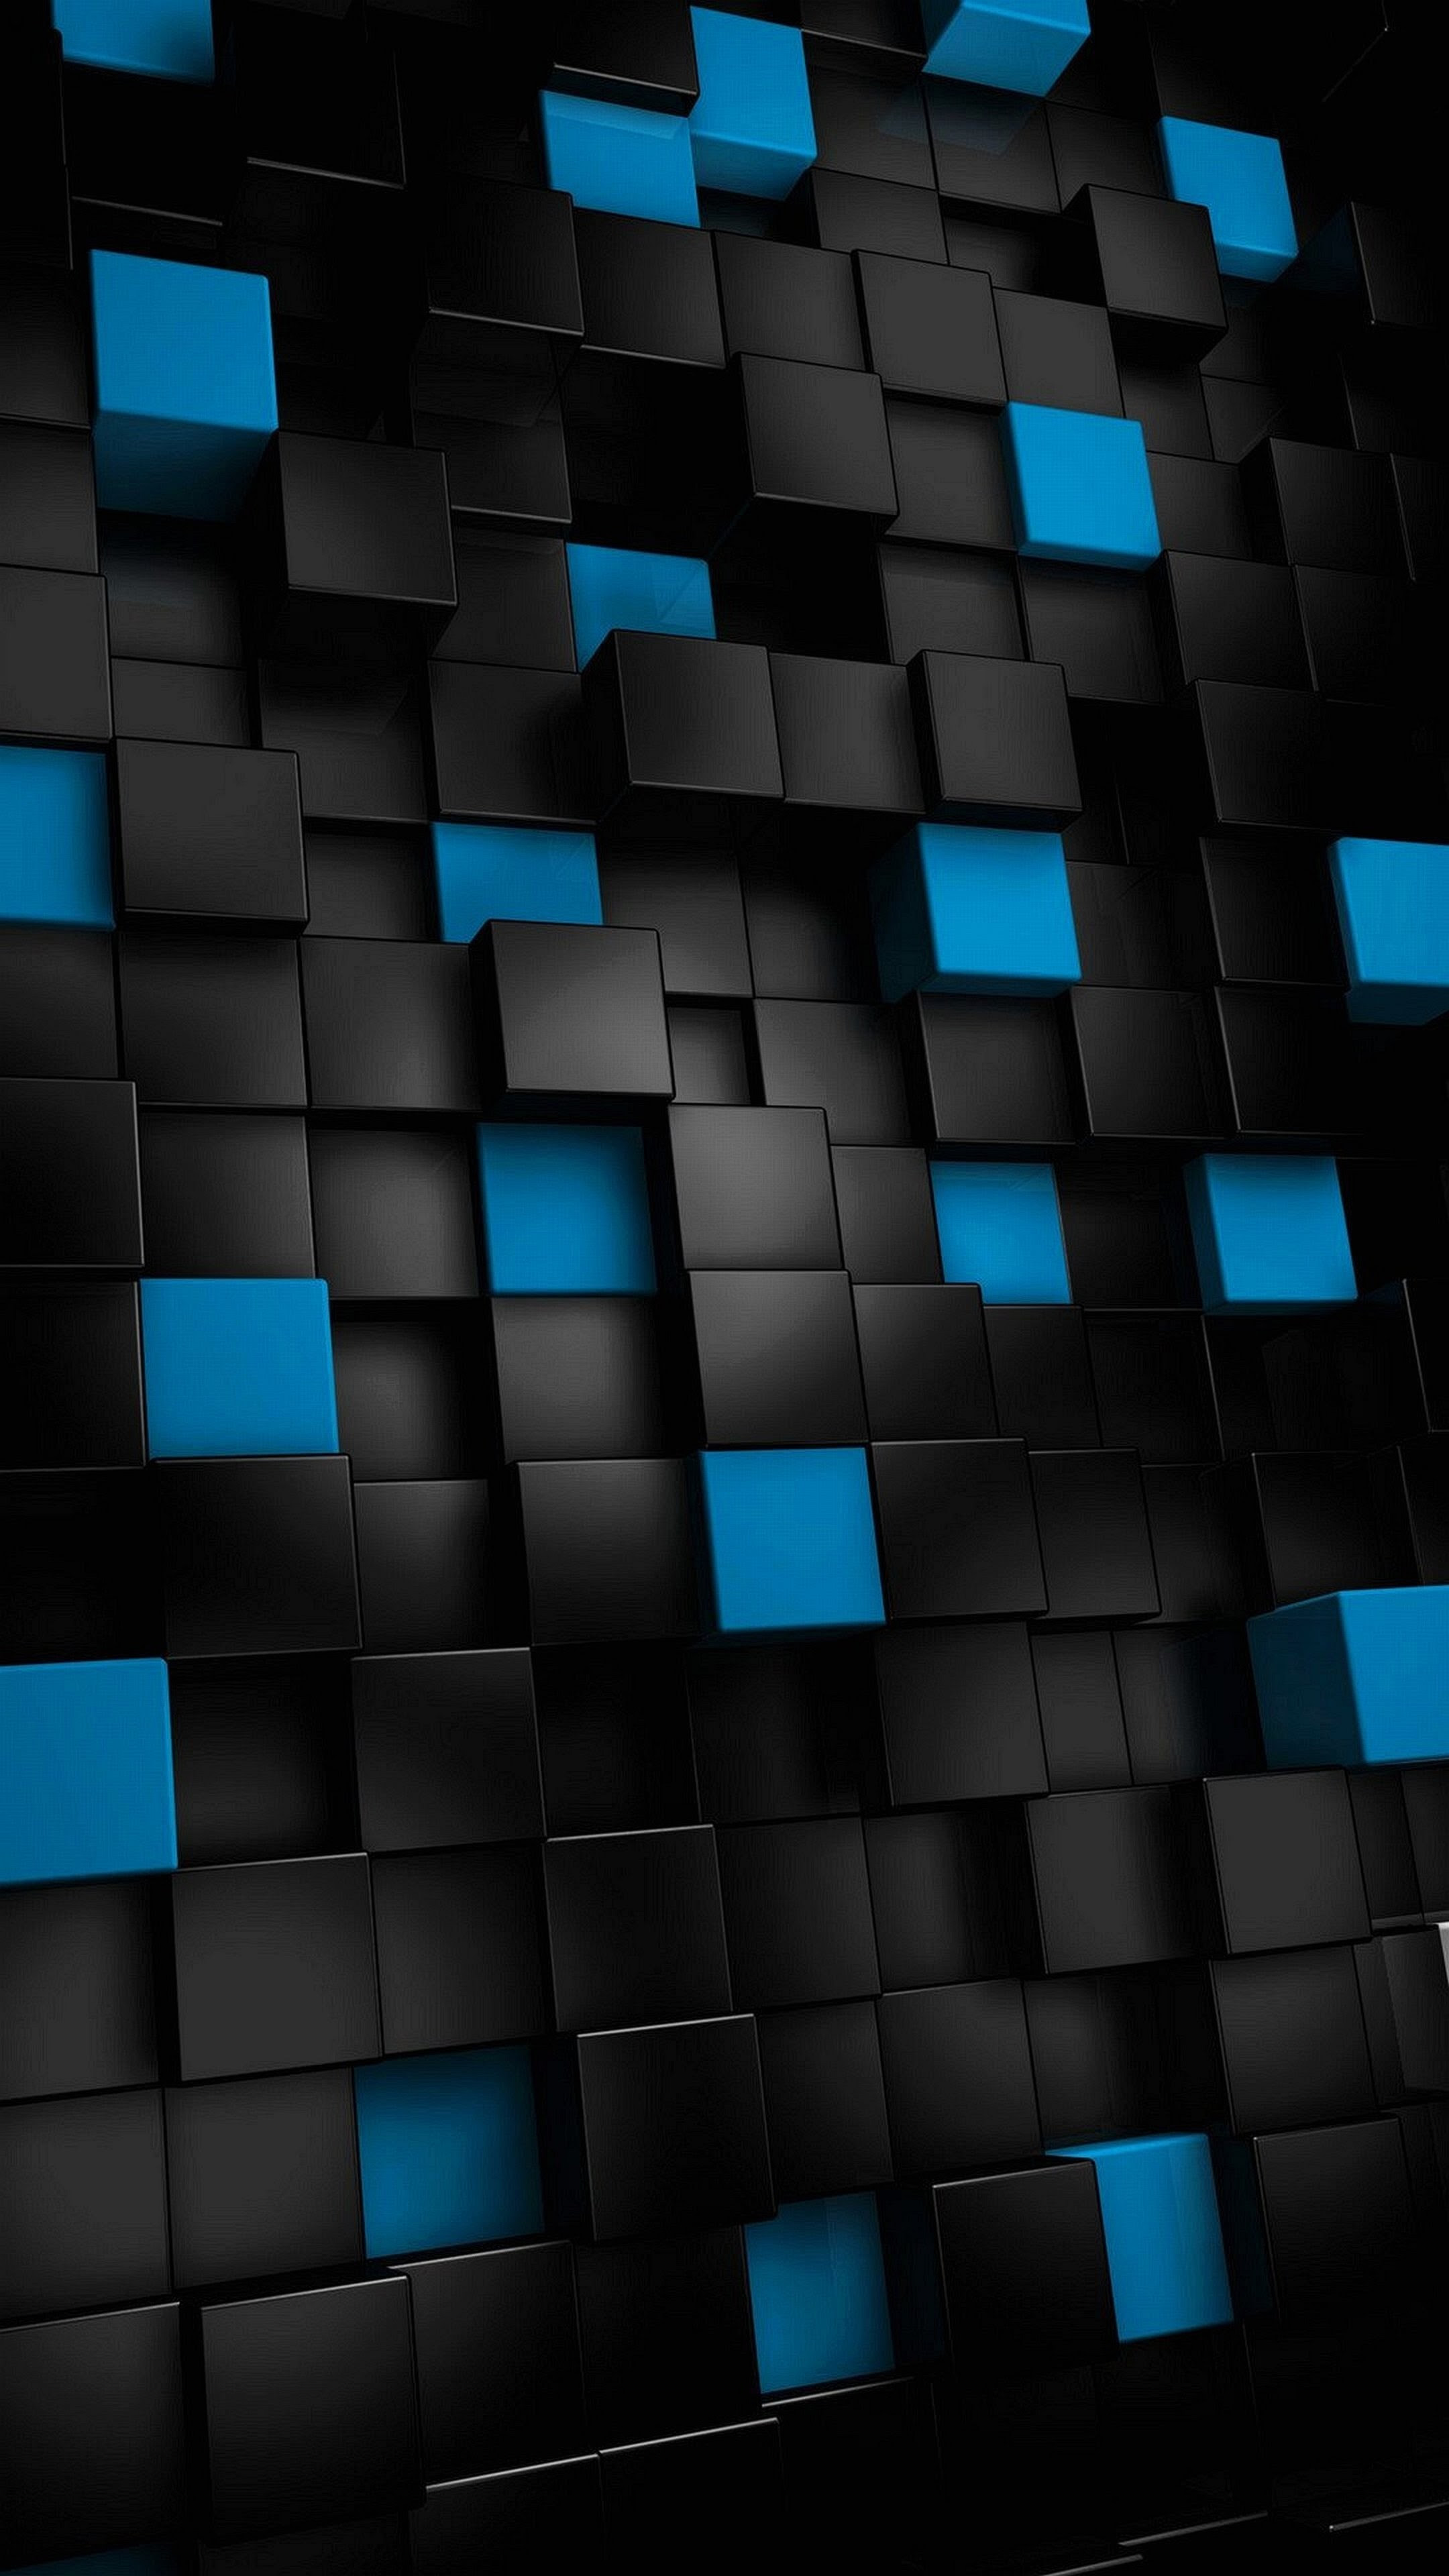 Cool iPhone Lock Screen Wallpaper (73+ images)